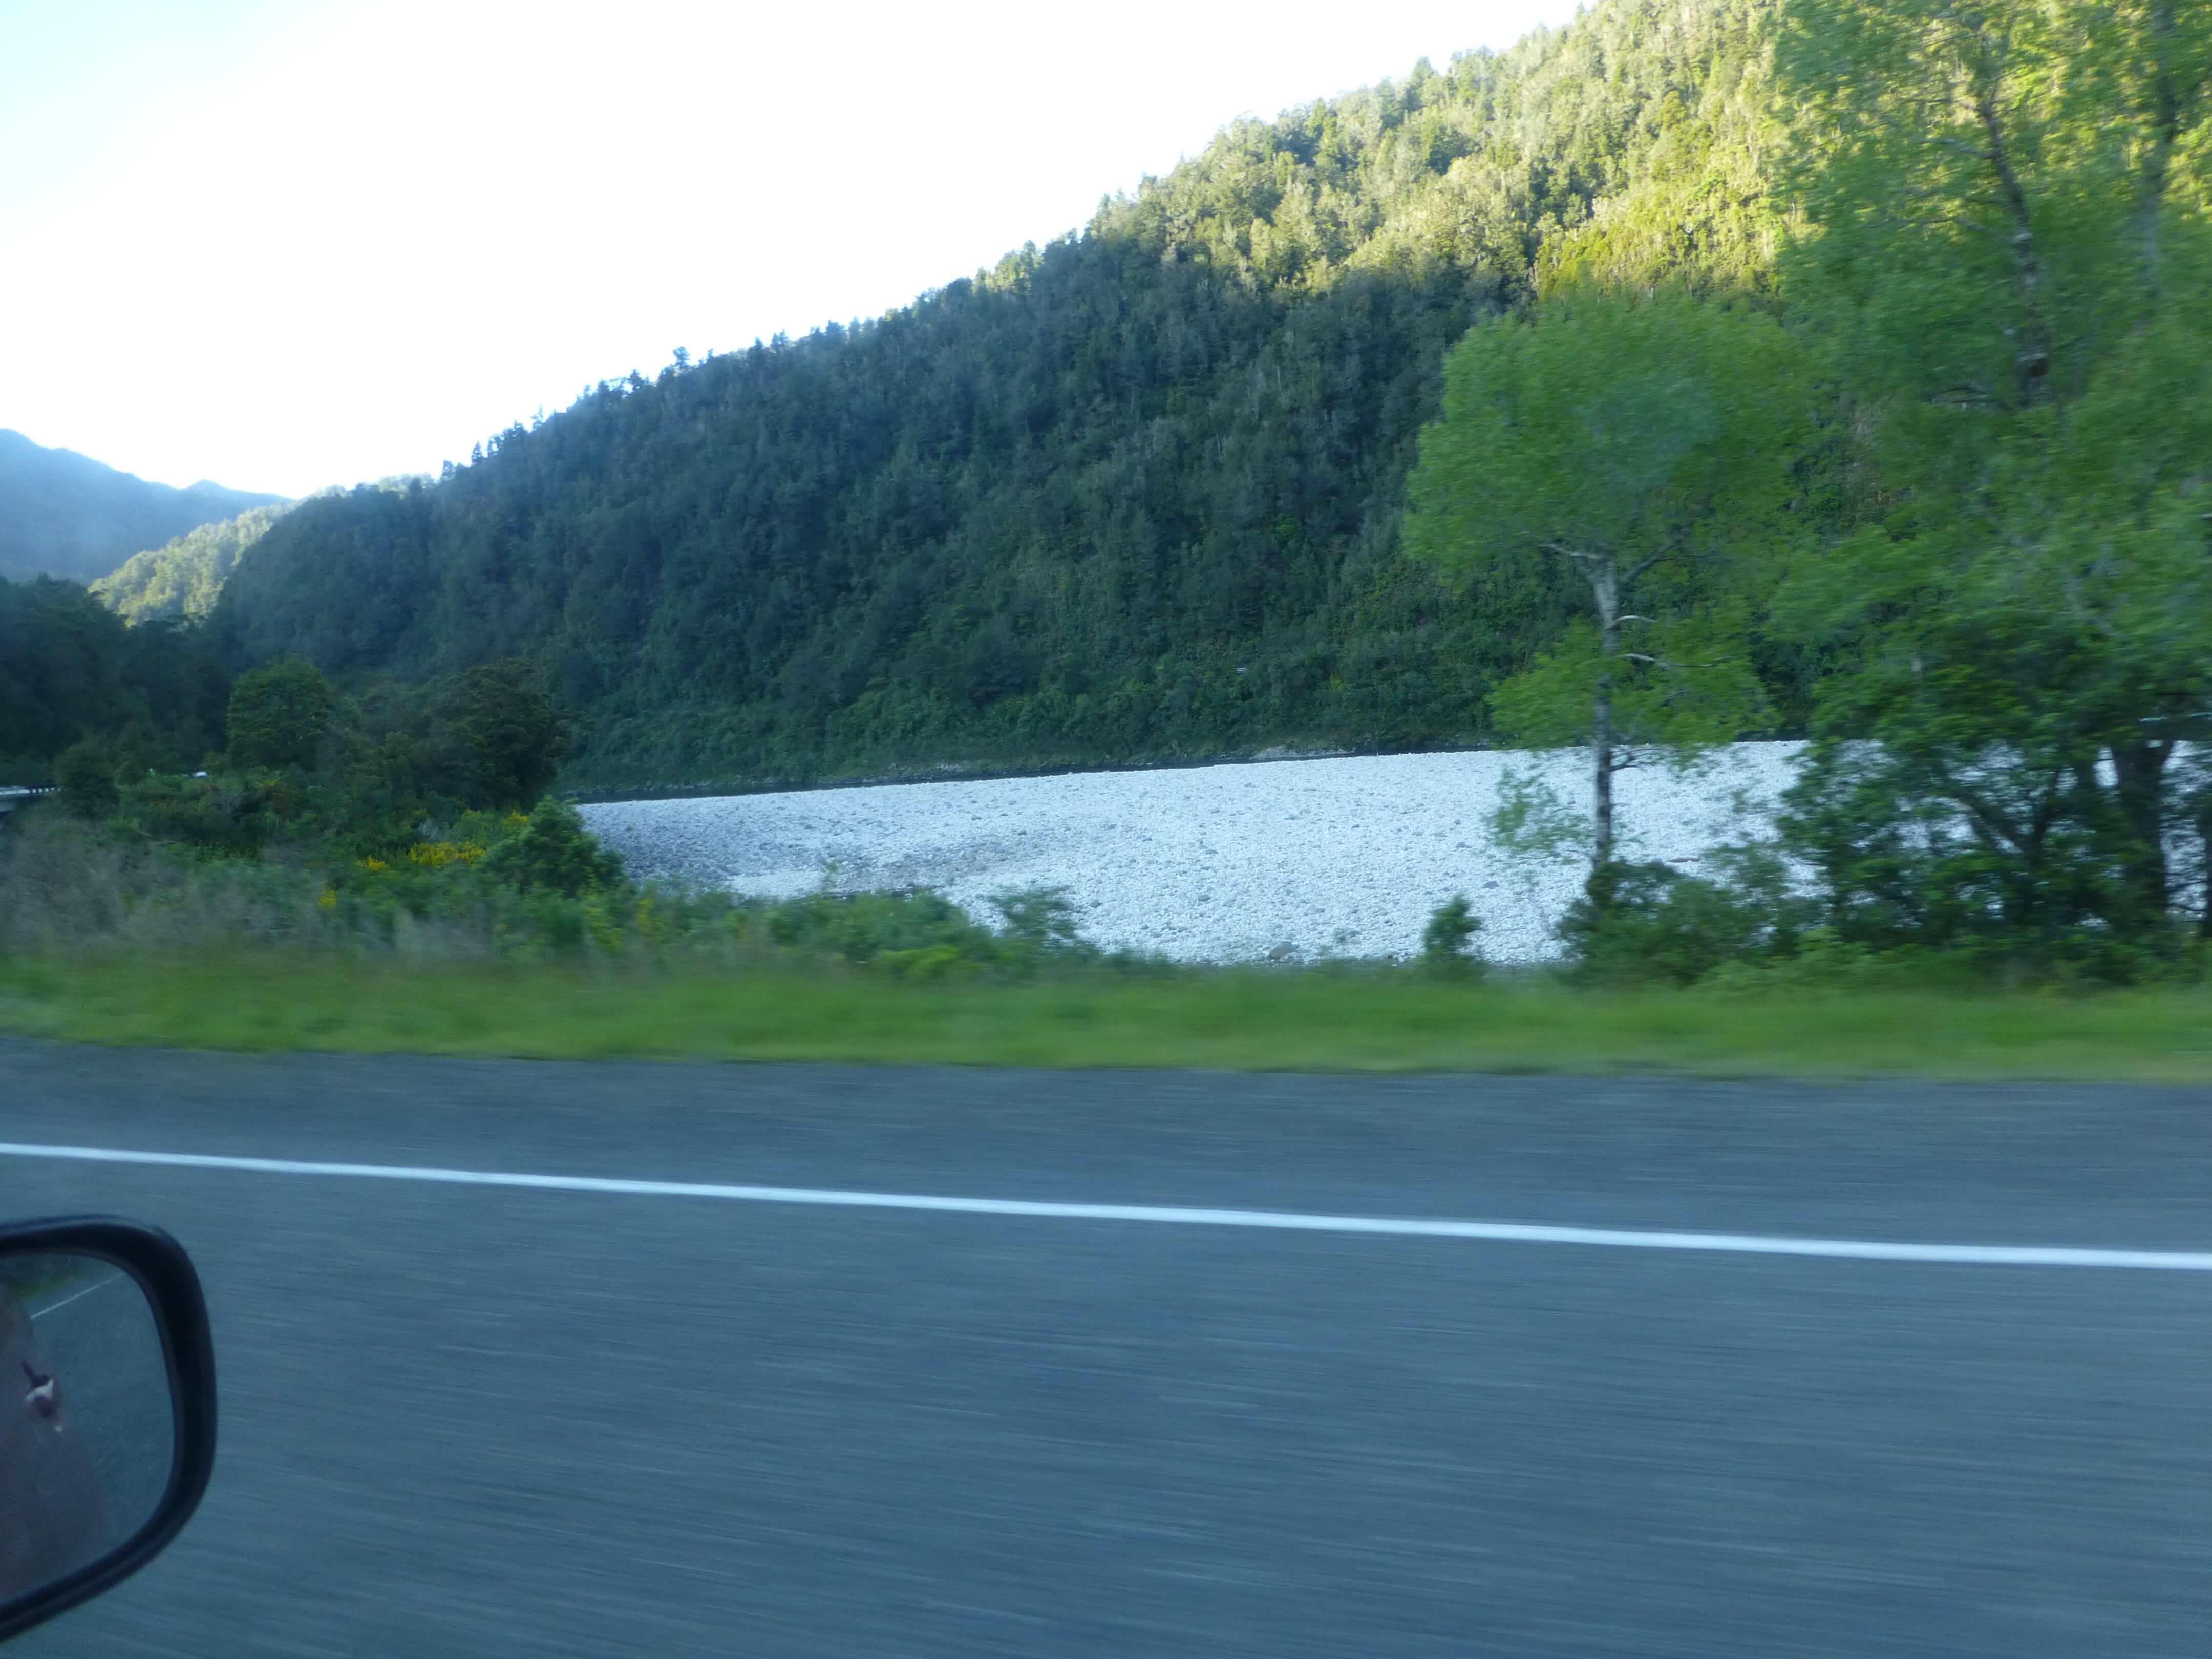 am Kilkenny Lookout, S6, Buller River, NZ 6